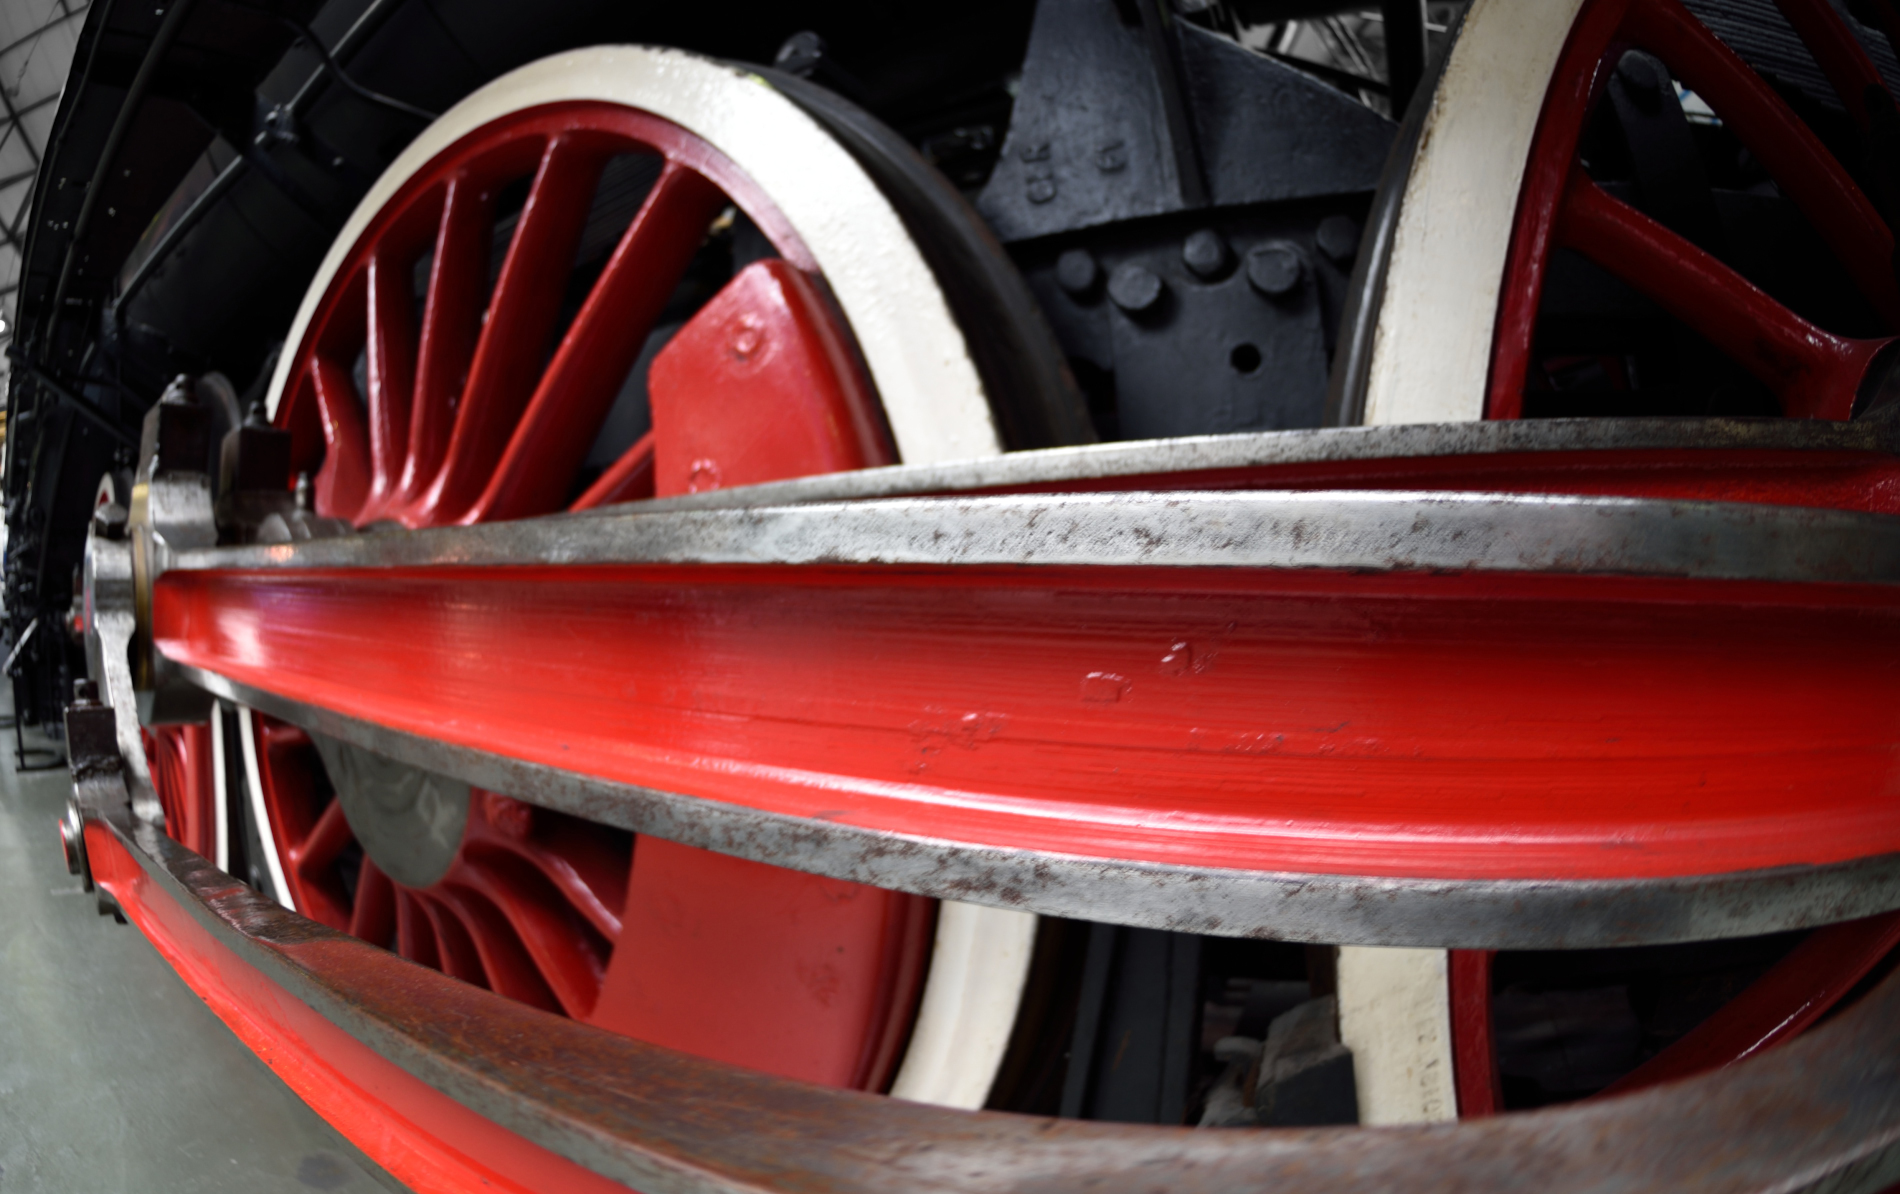 YORK, Engeland - Spoormuseum